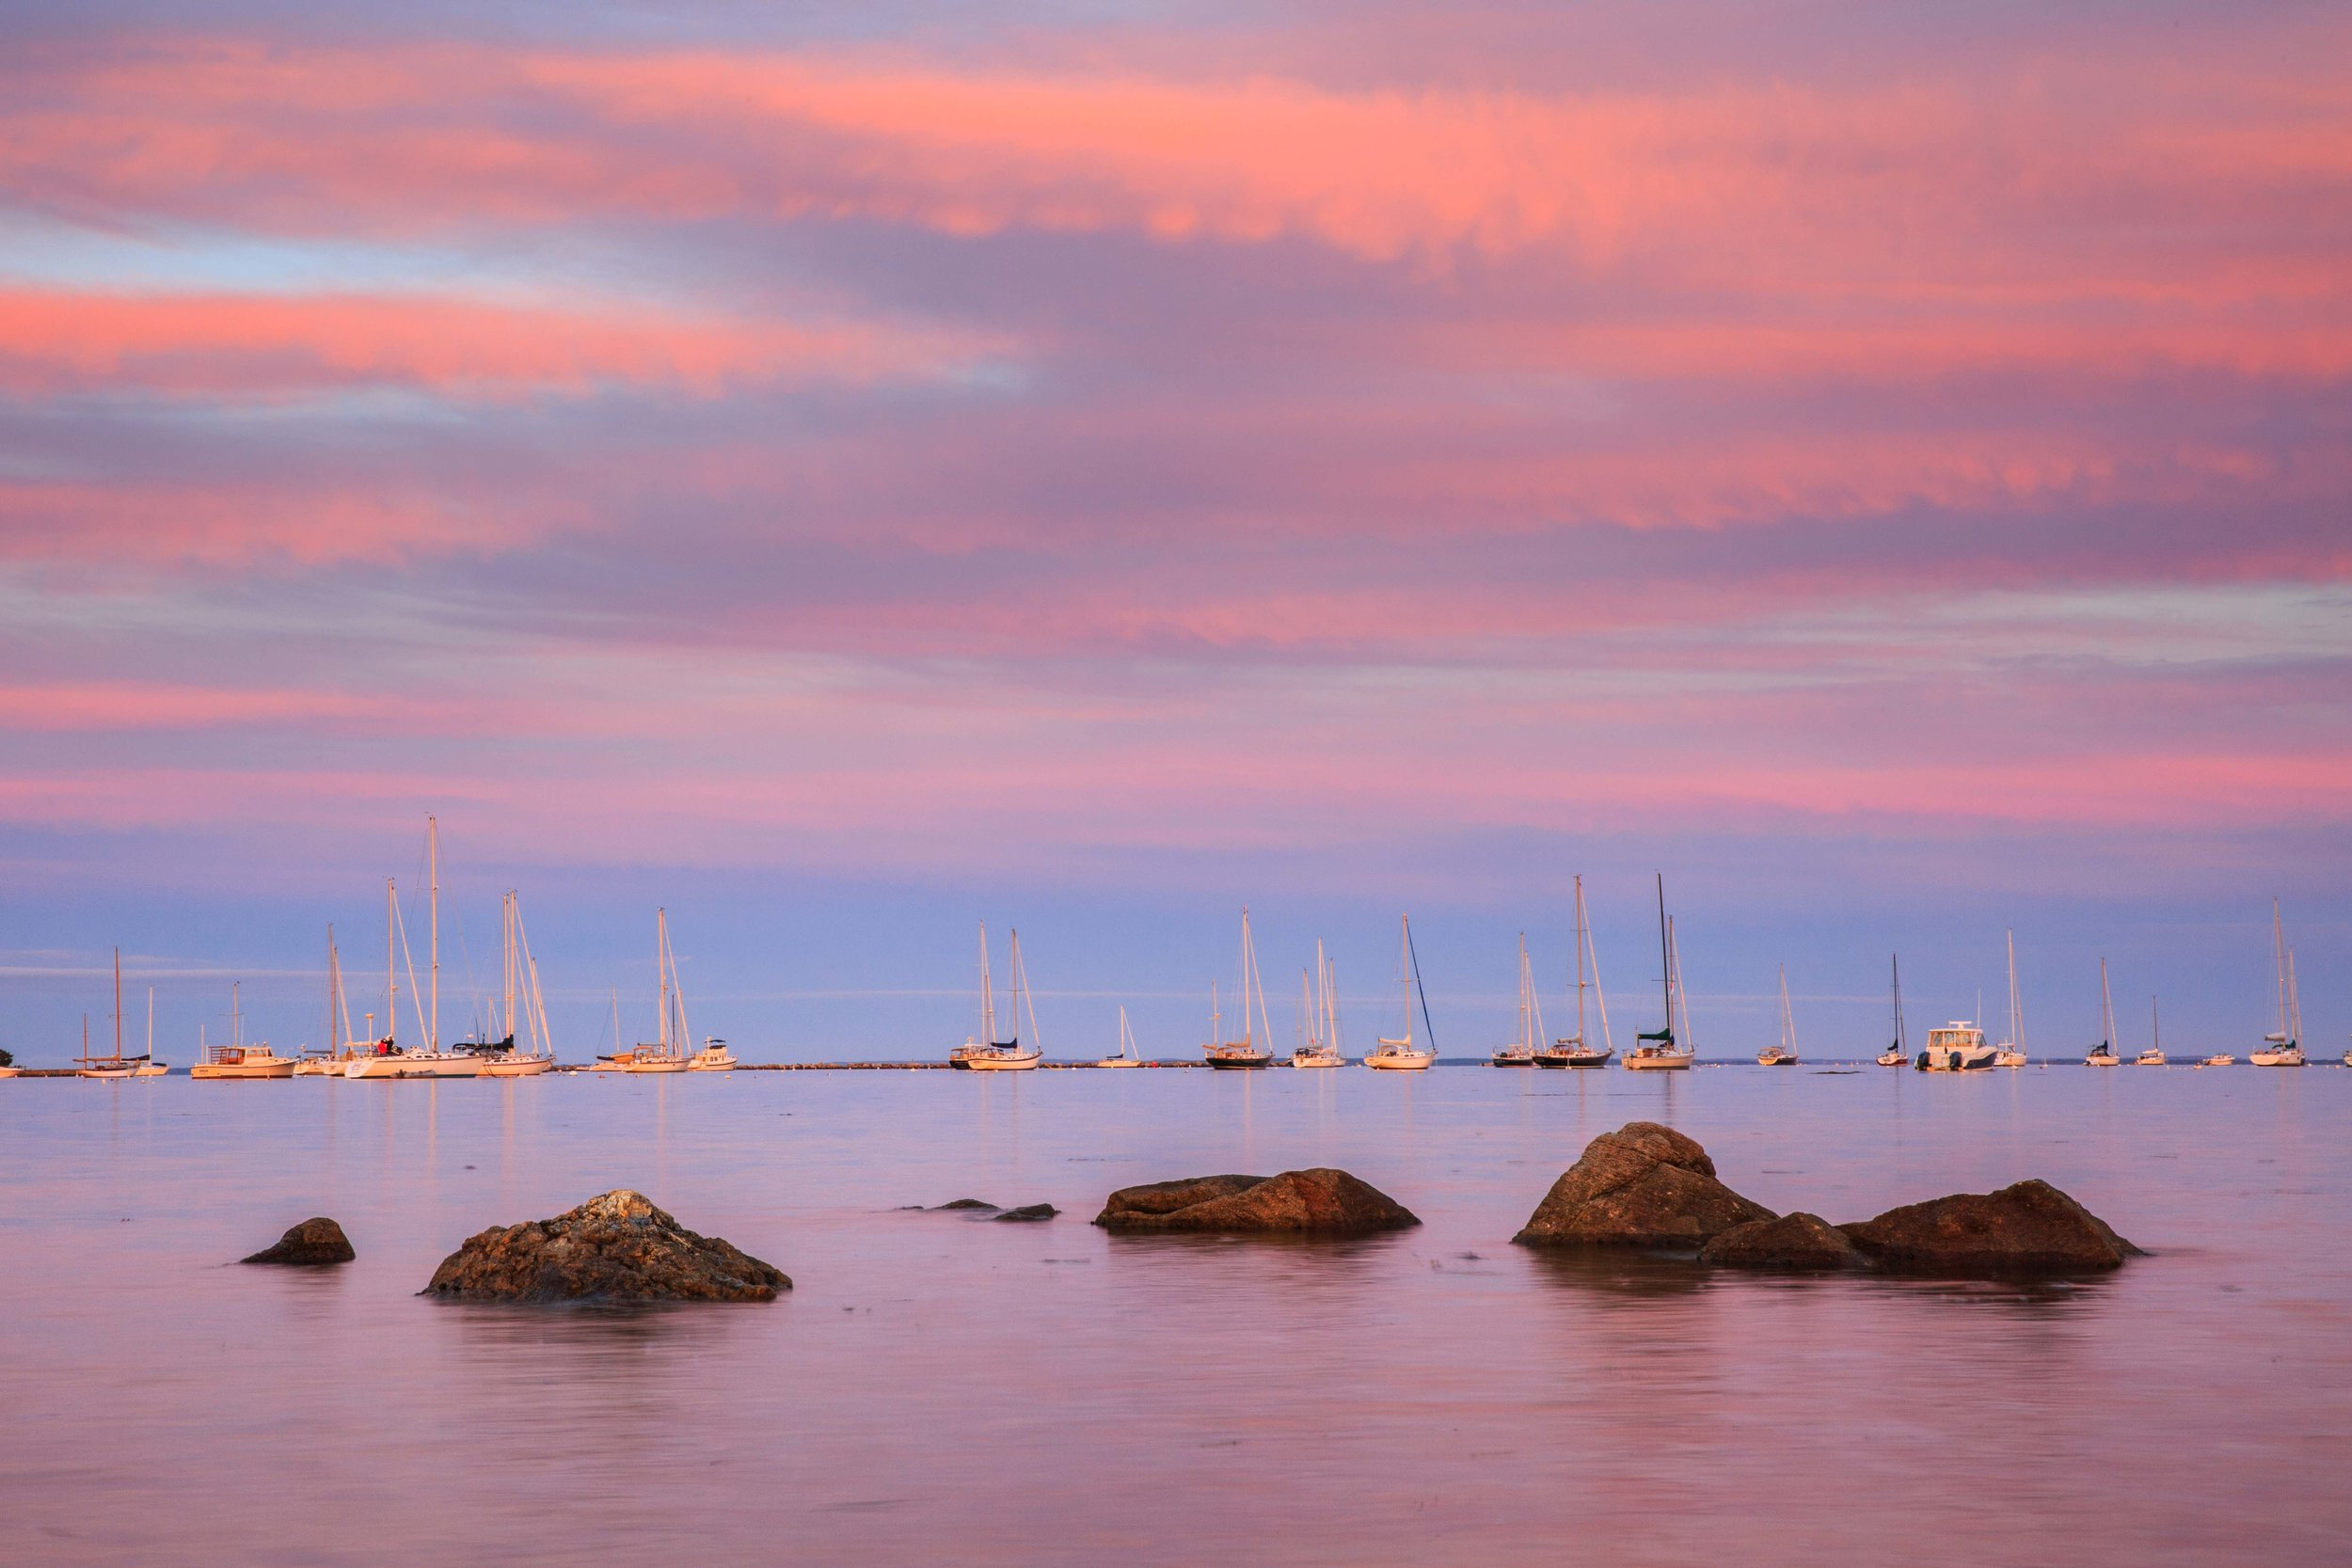 Padanaram Harbor - South Dartmouth, MA